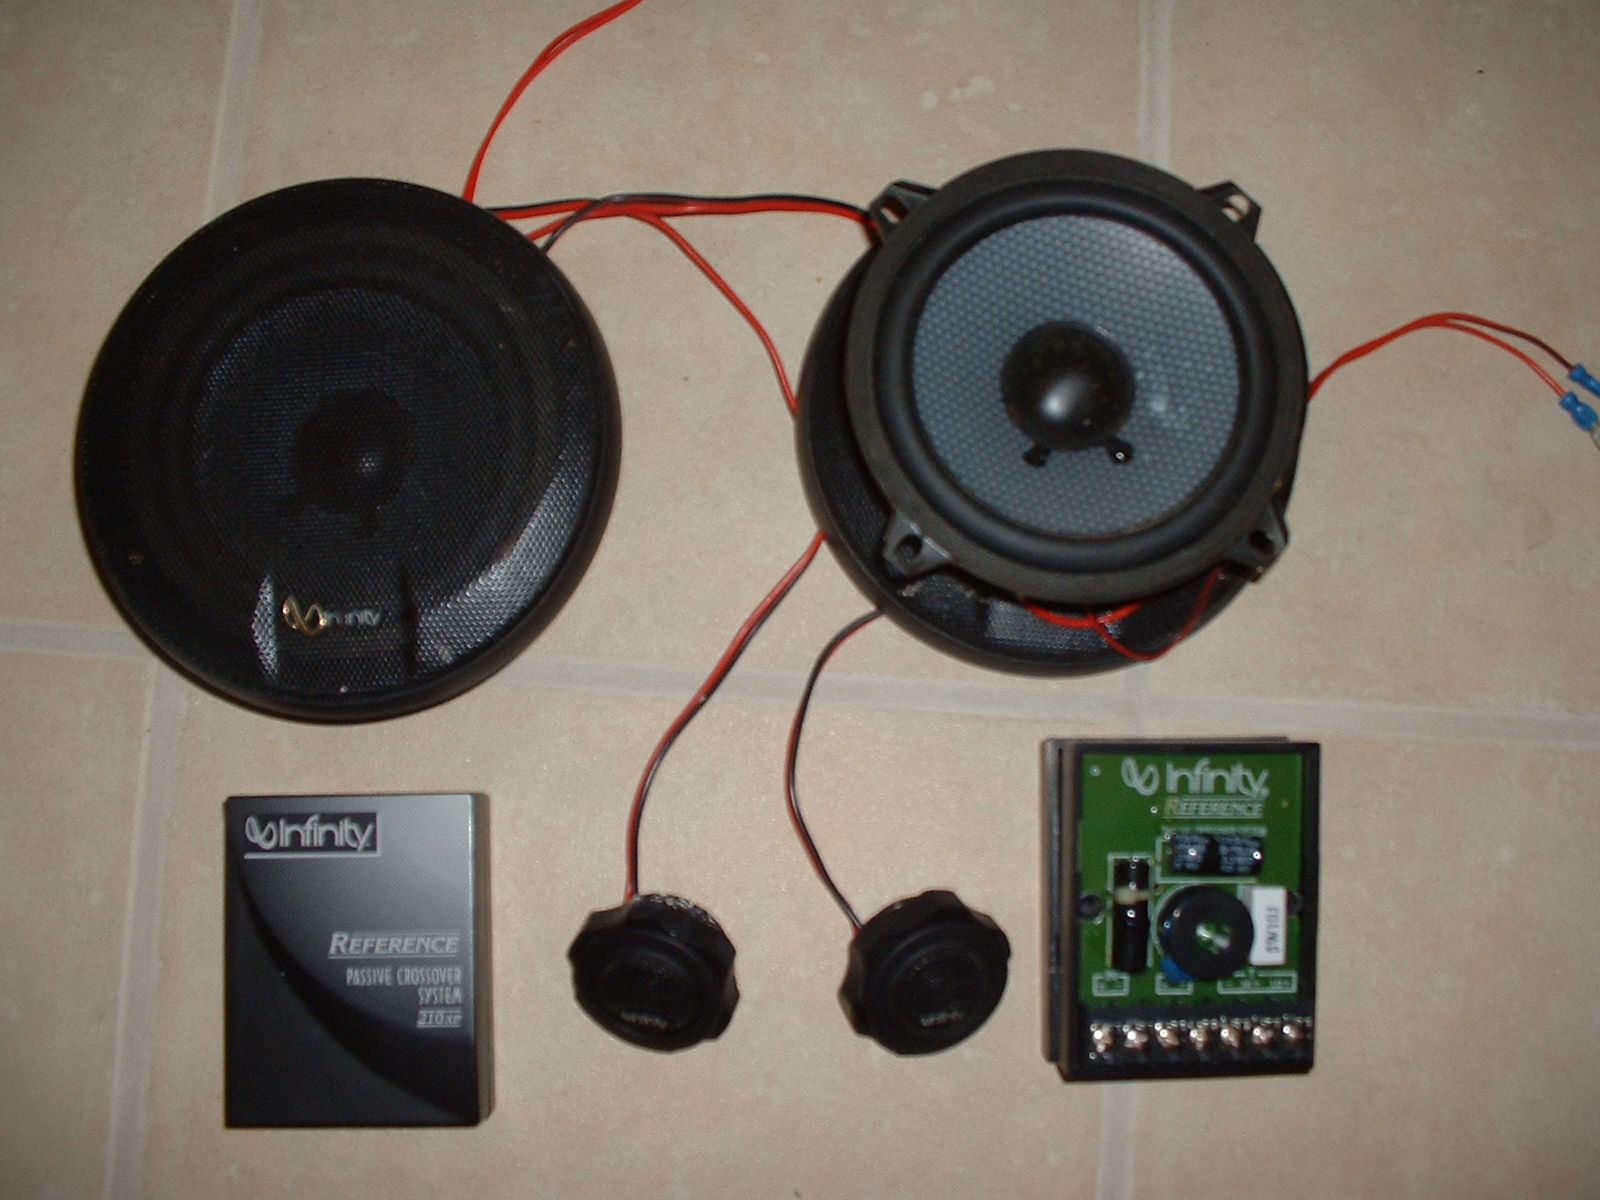 hight resolution of car audio blowout sony infinity jbl kenwood third generation fcar audio blowout